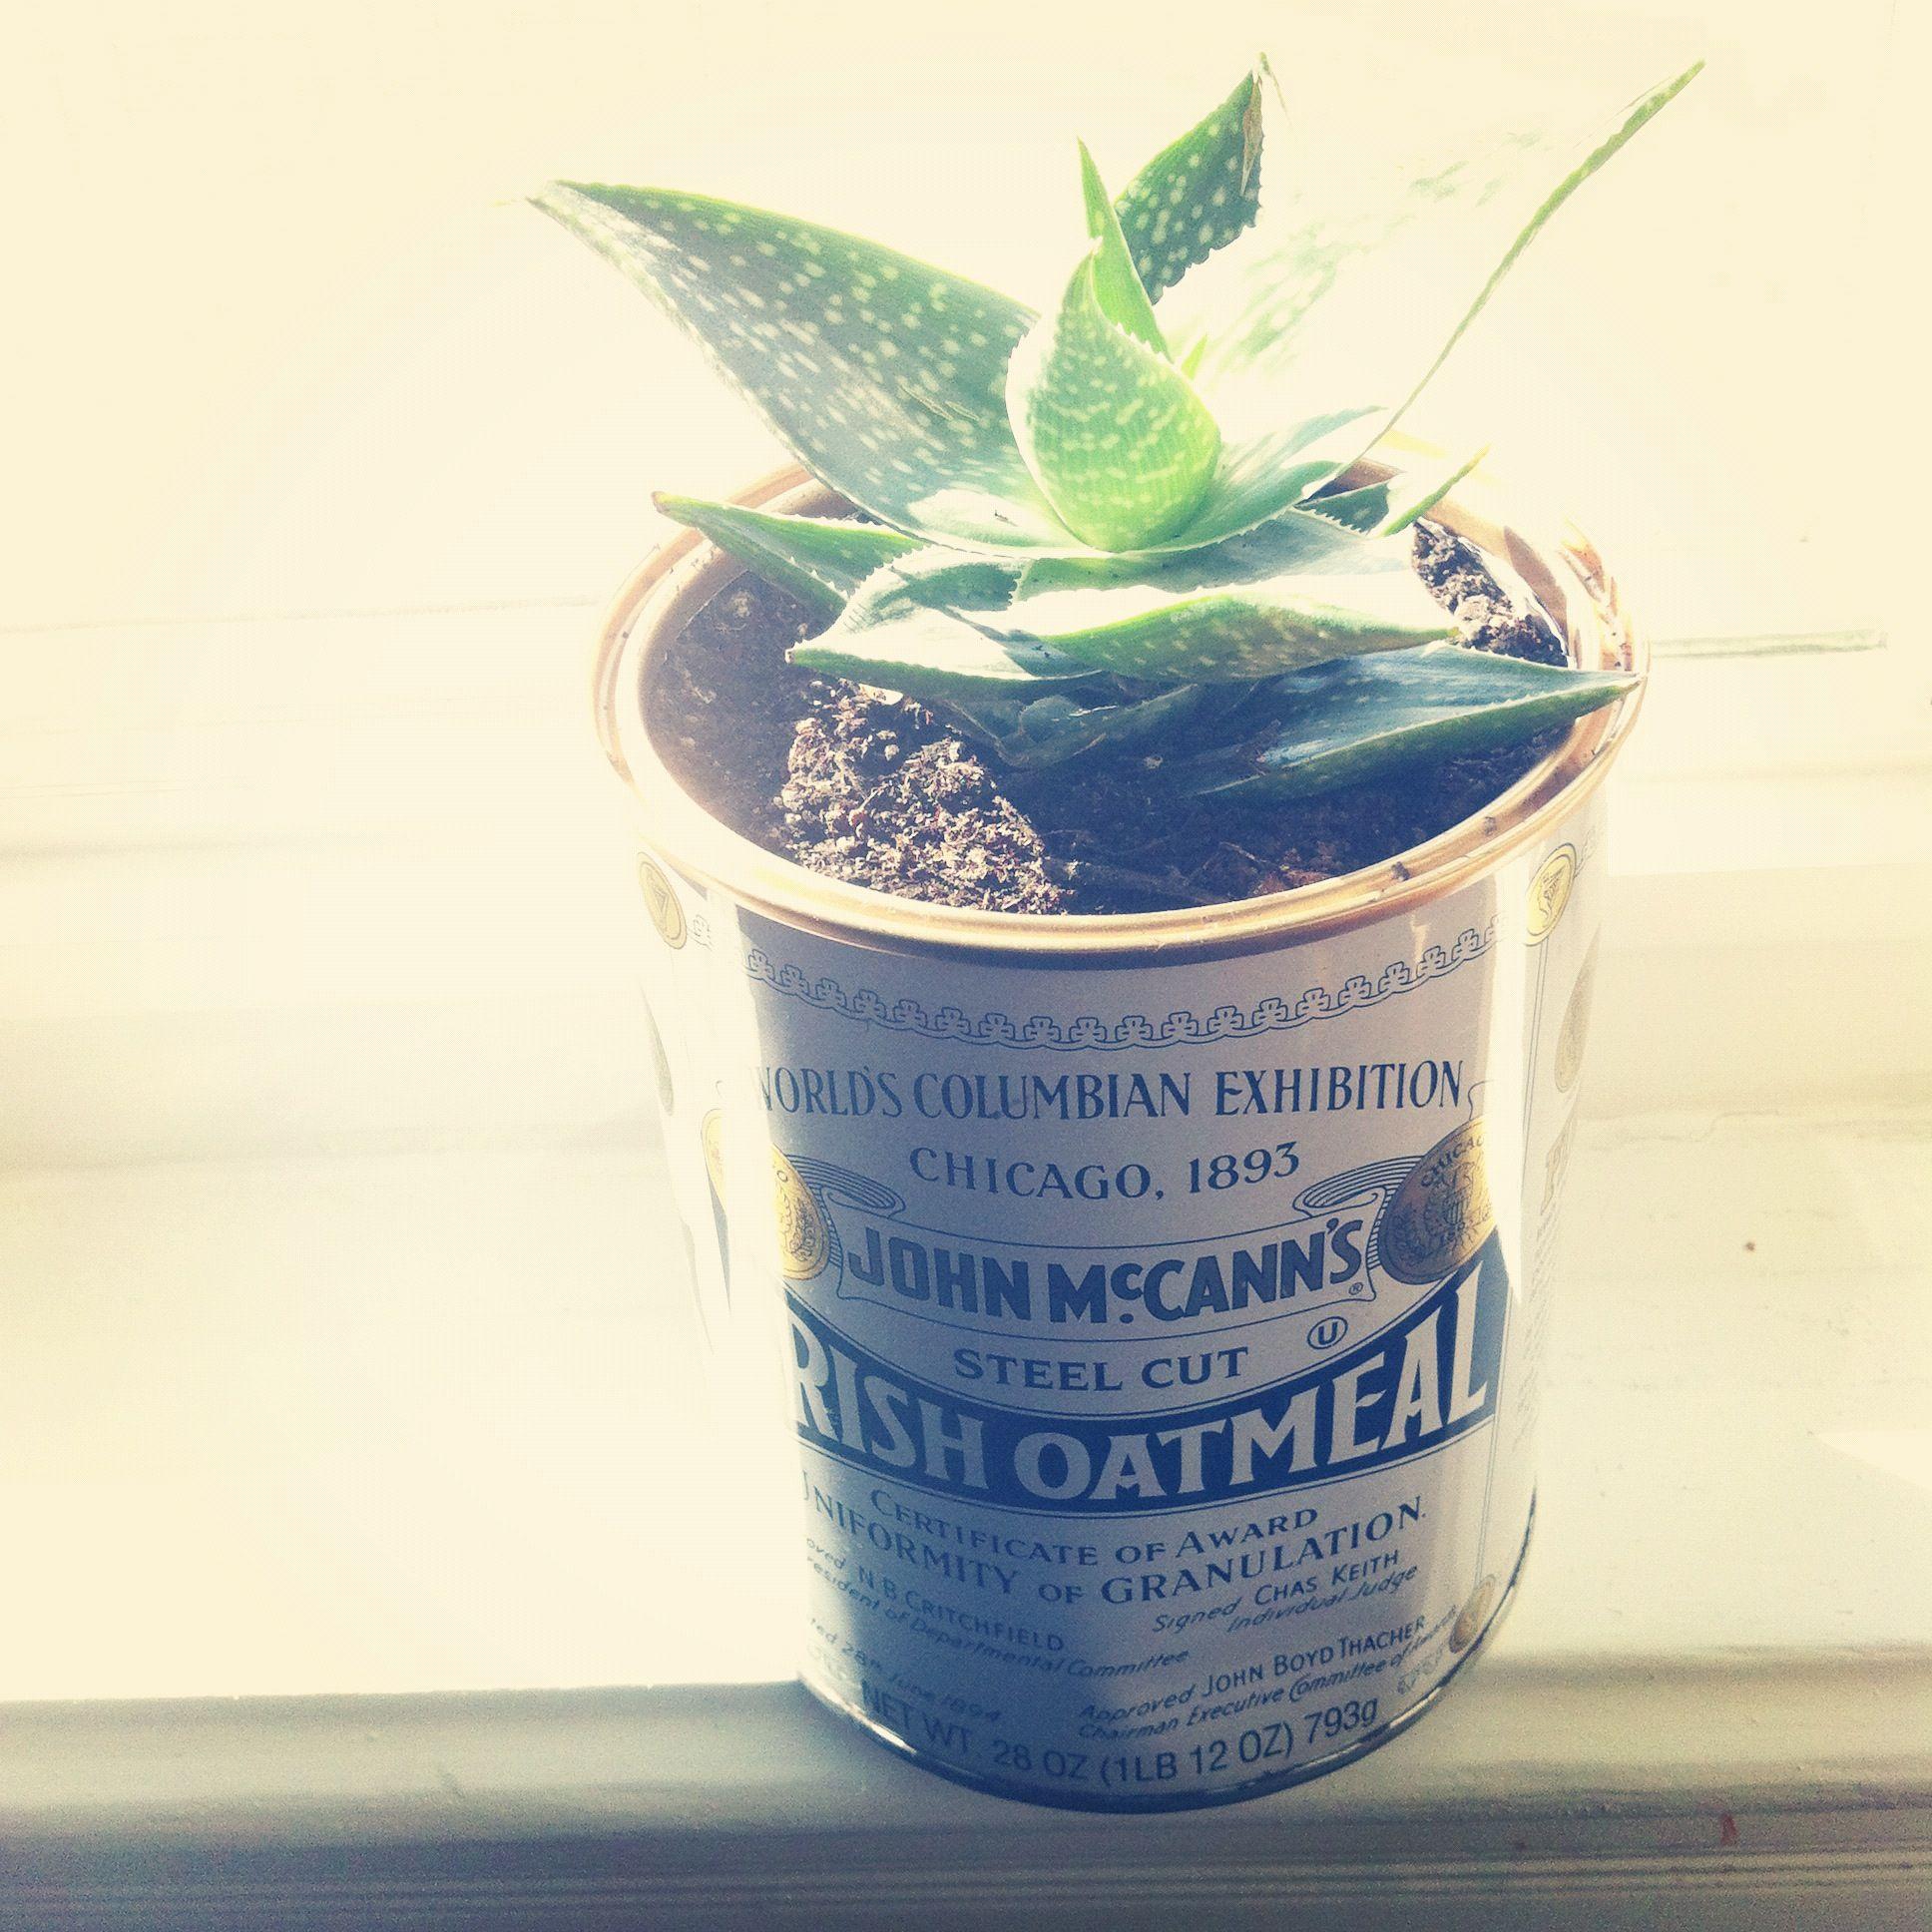 Reusing cans to pot studio plants.